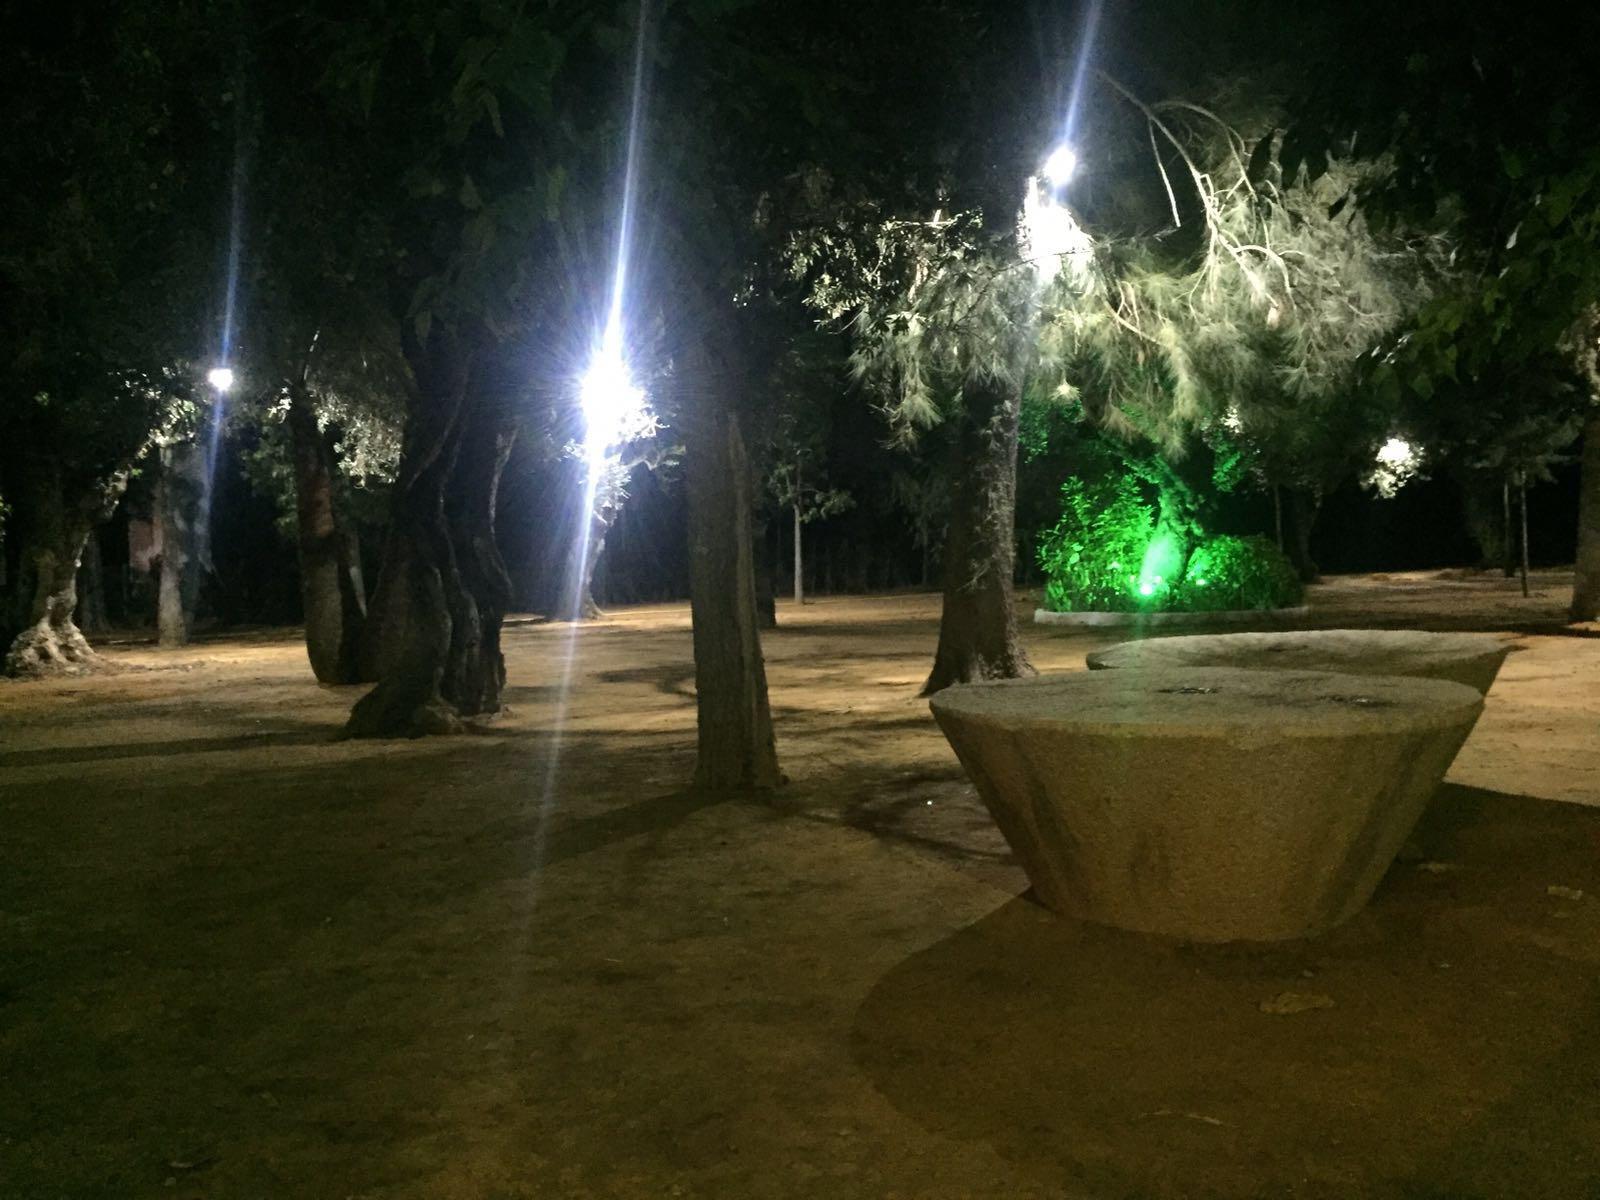 Iluminaci n para jardines y eventos climalcor for Luces led jardin ikea